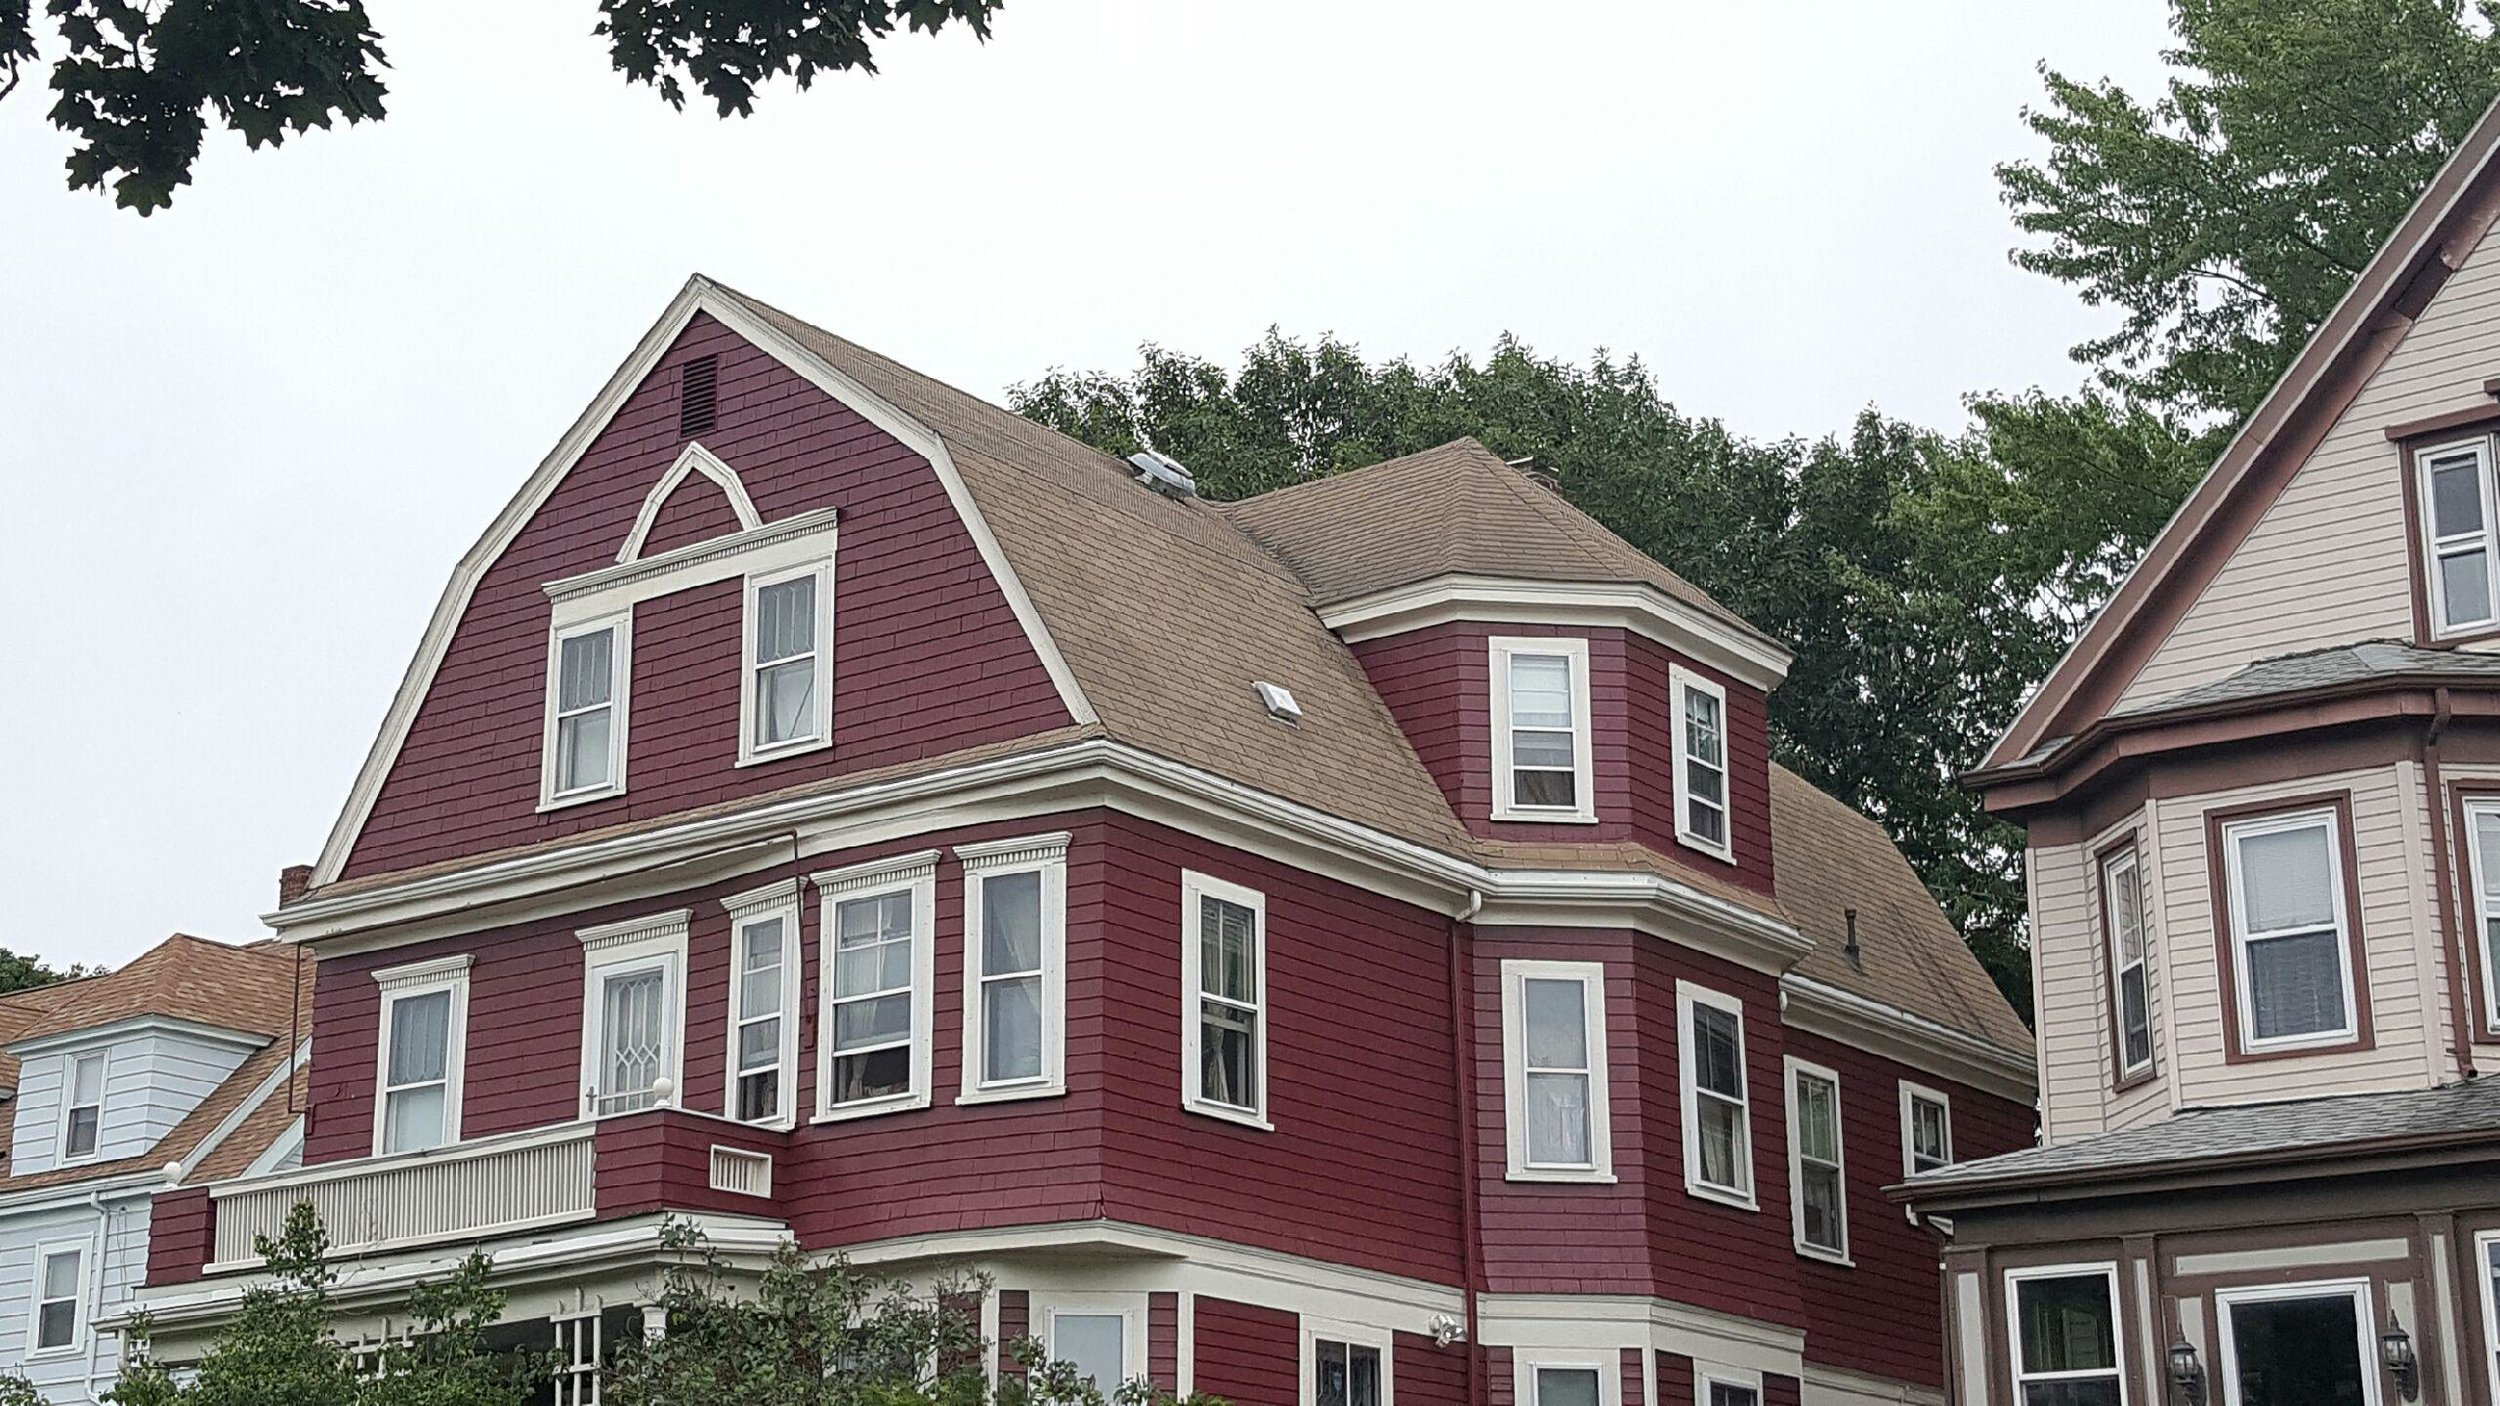 Black Metal Roof in Somerville - Before